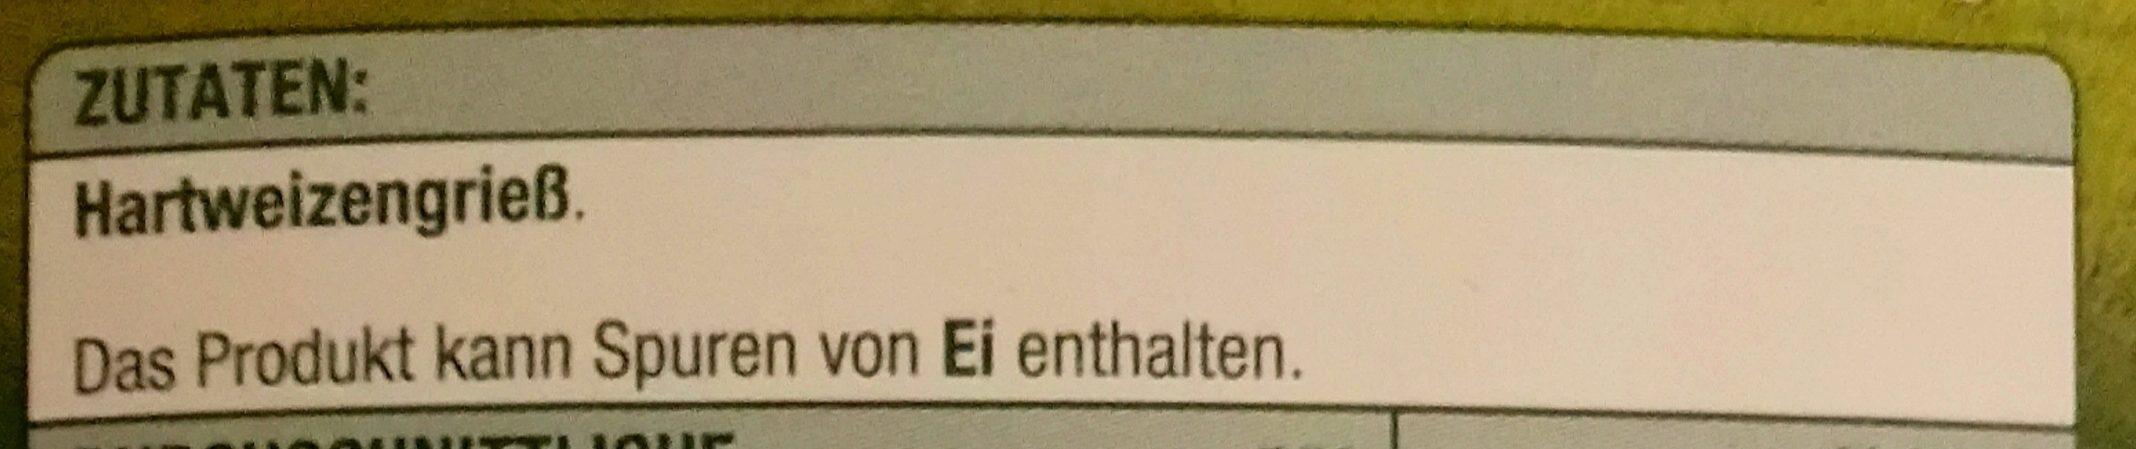 Cannelloni N.64 - Ingrediënten